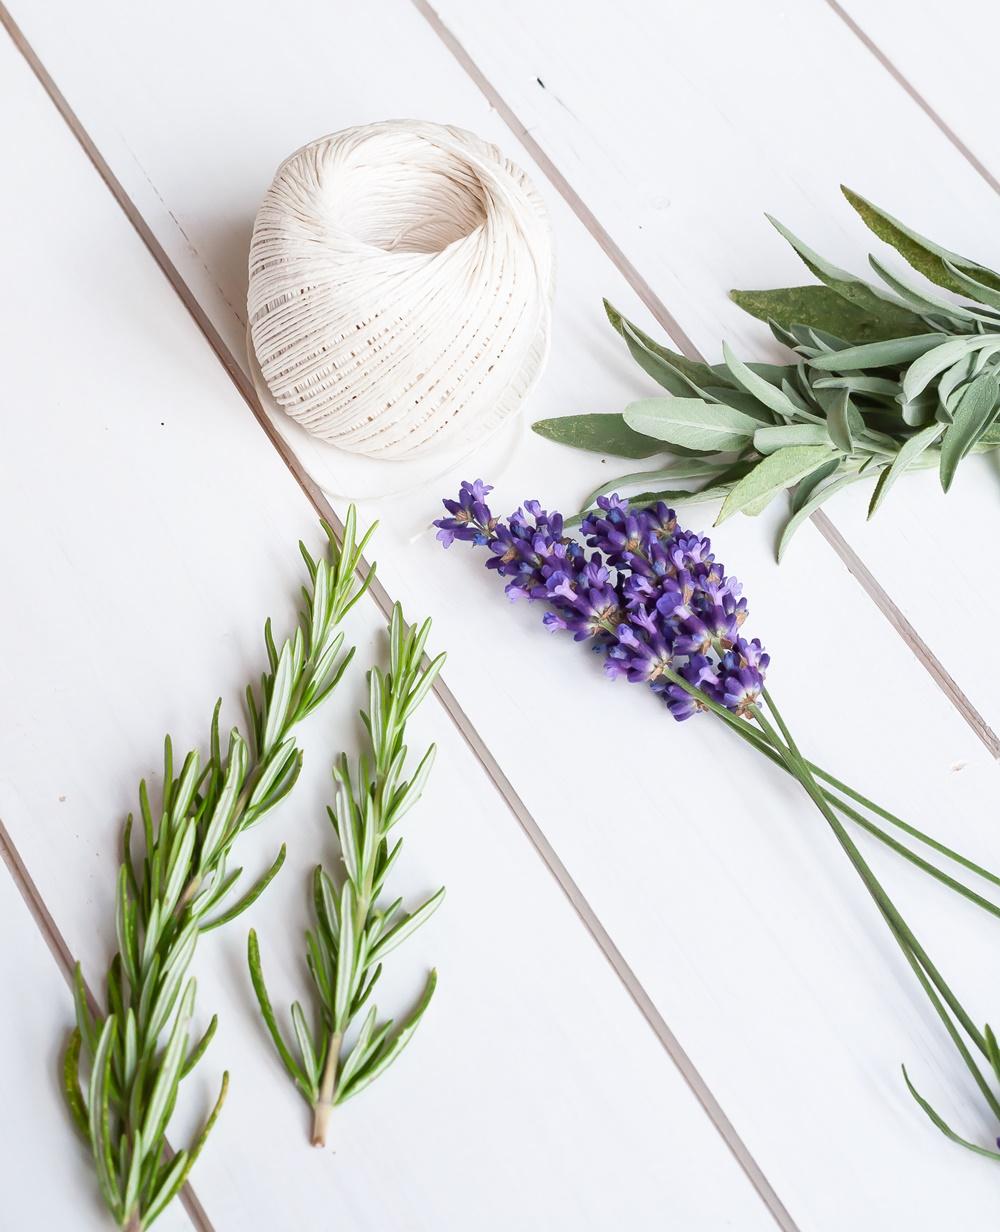 Rosmarin Lavendel Salbei